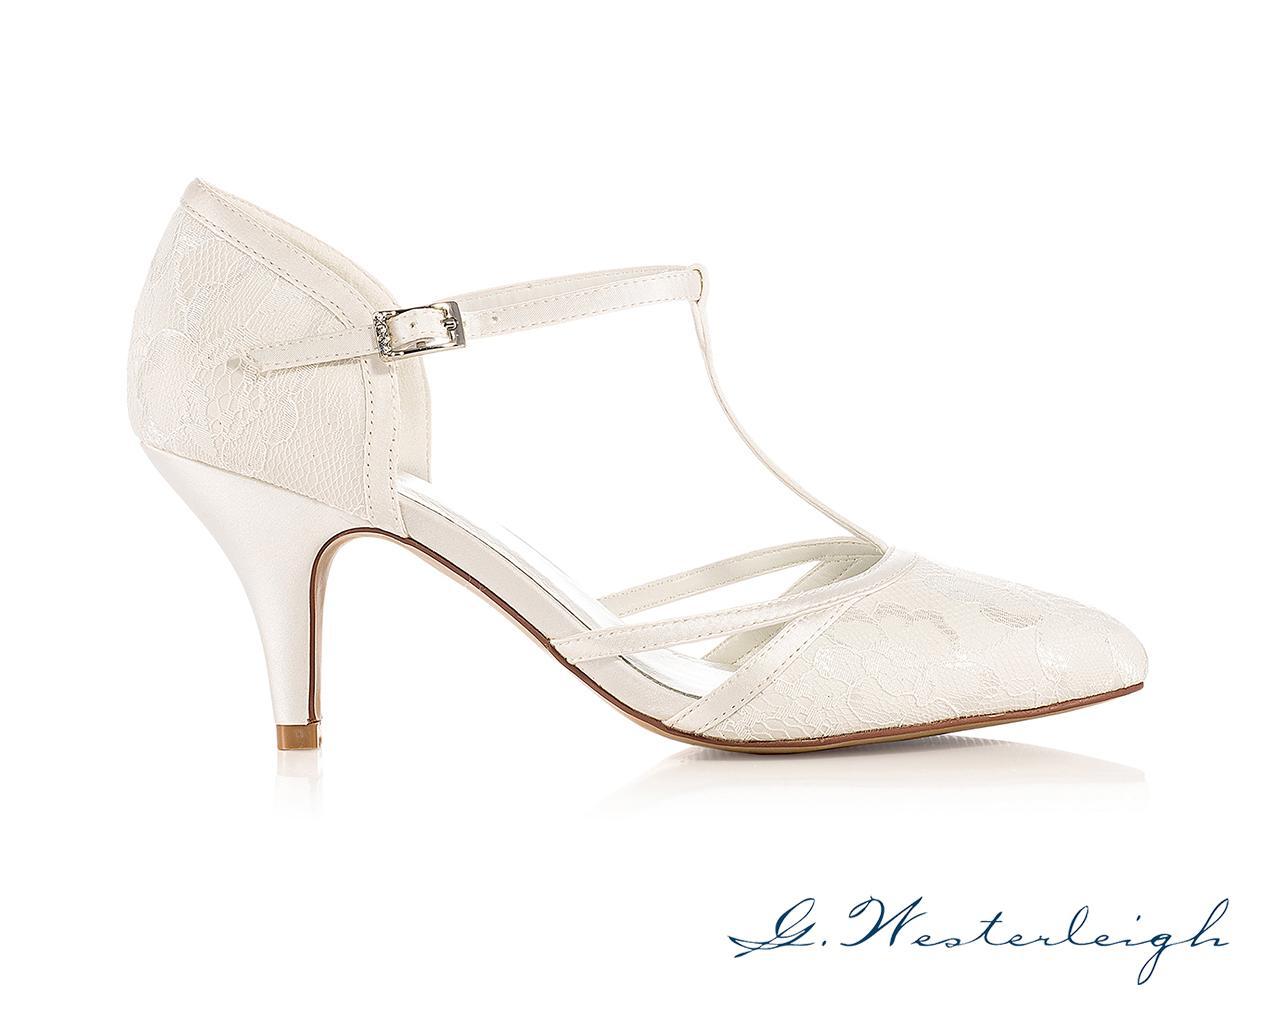 Svadobné topánky Jasmine - Obrázok č. 2